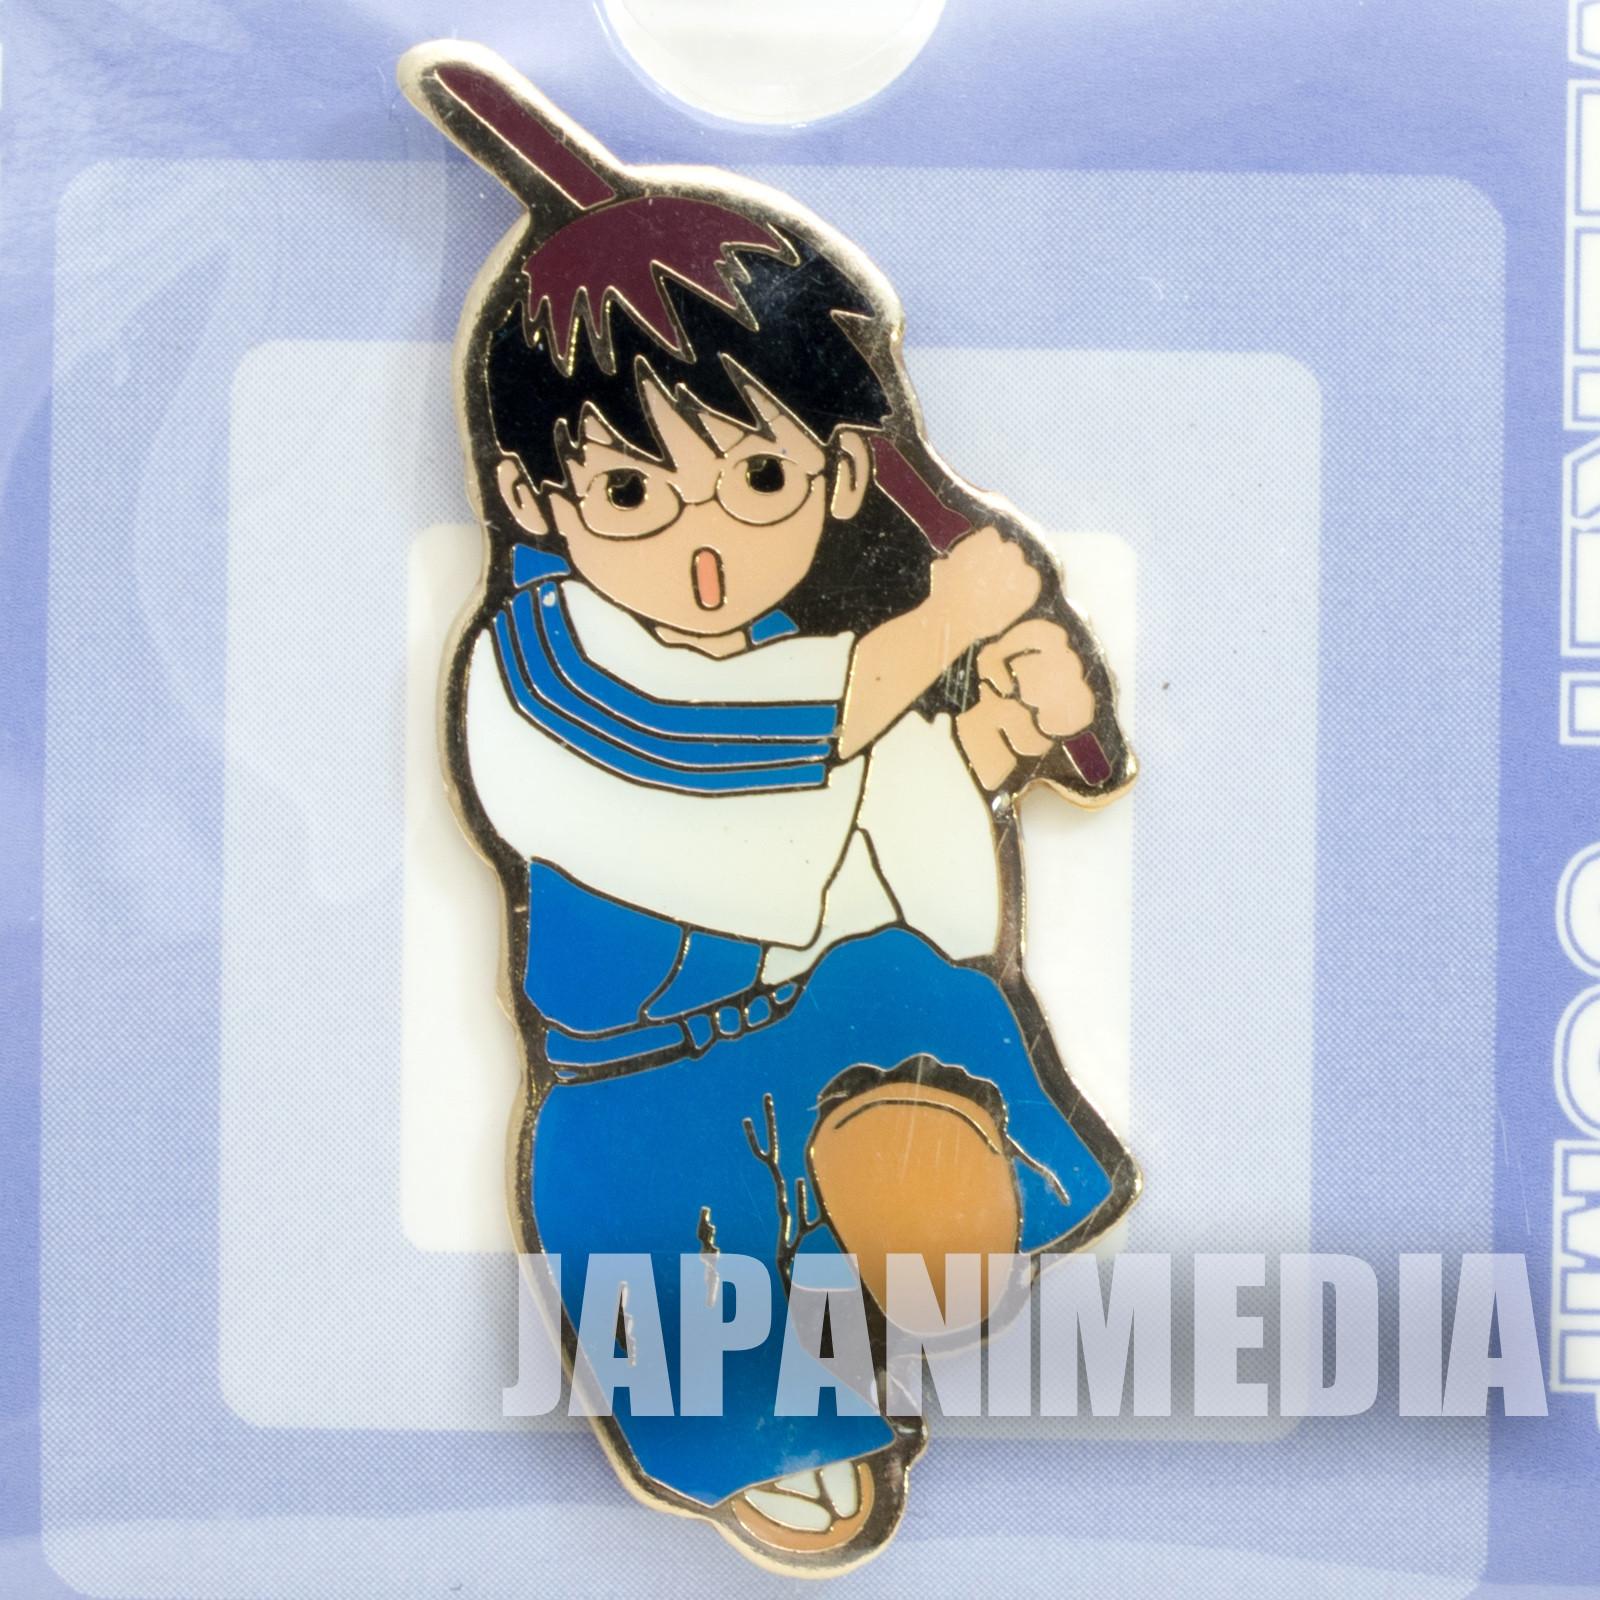 Gintama Shinpachi Shimura (SD ver.) Weekly Jump Character Pins JAPAN ANIME MANGA